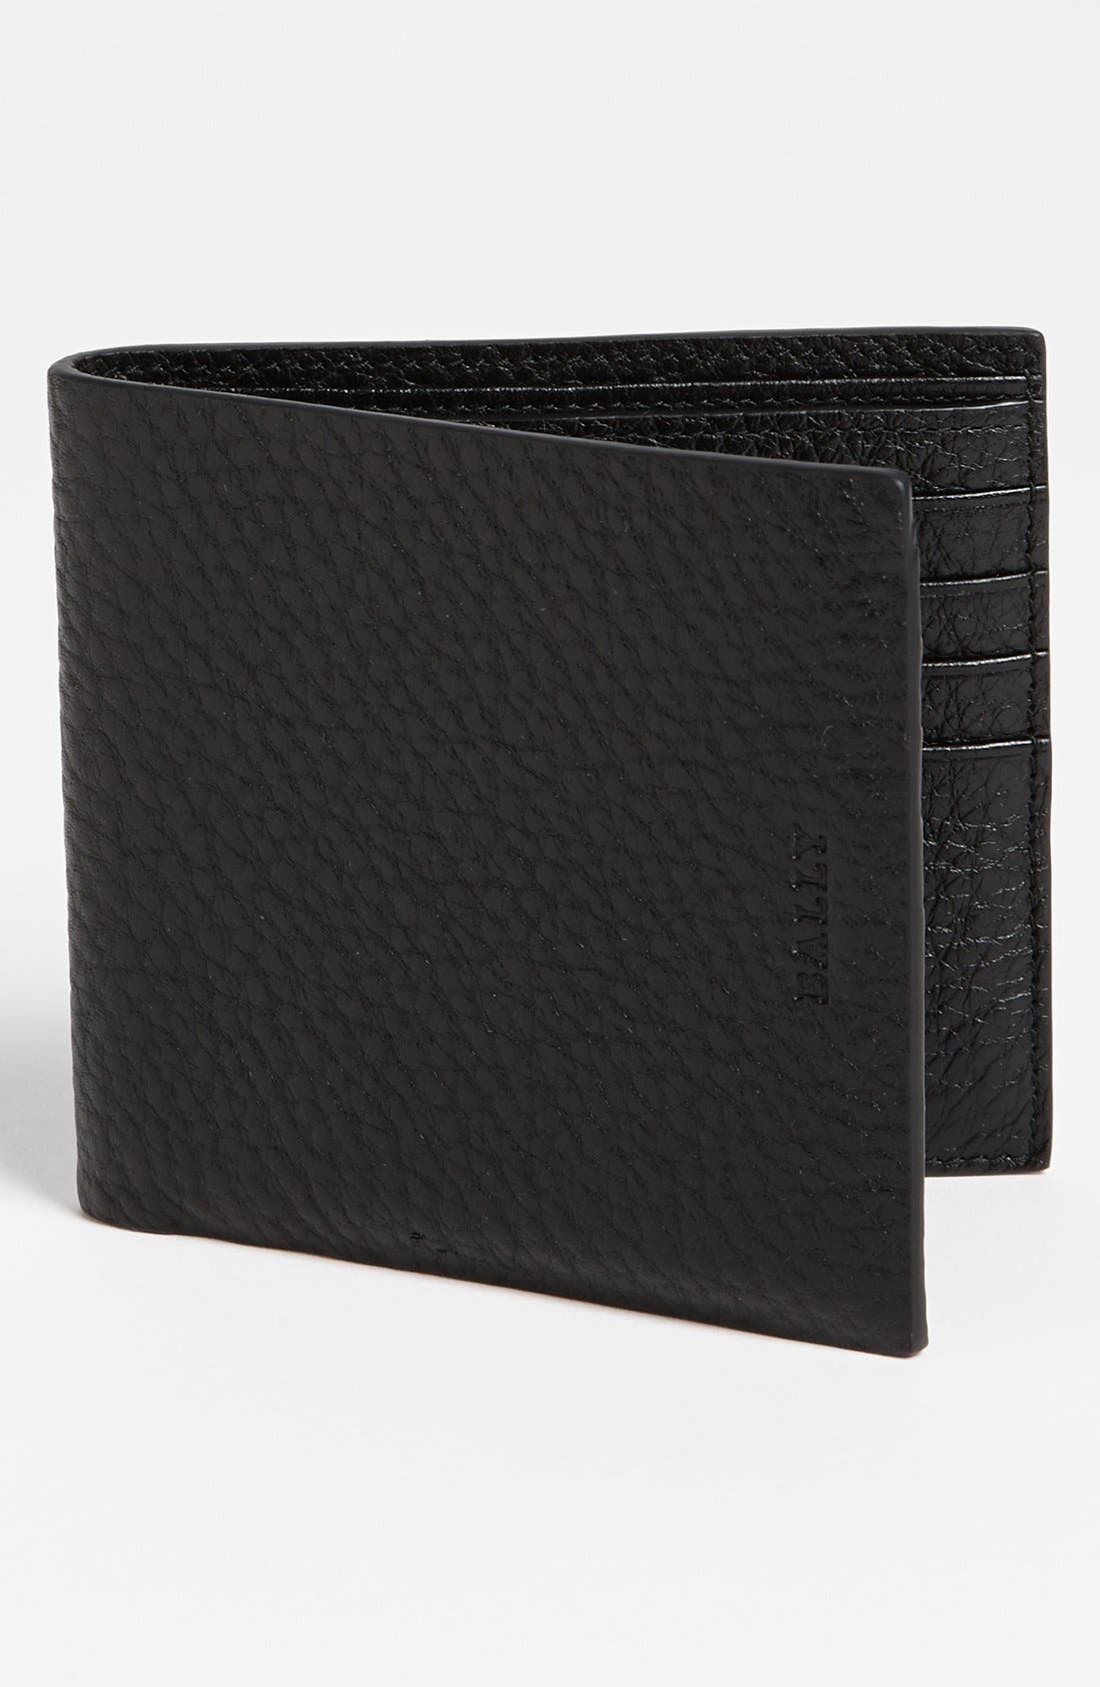 Main Image - Bally Bifold Calfskin Wallet